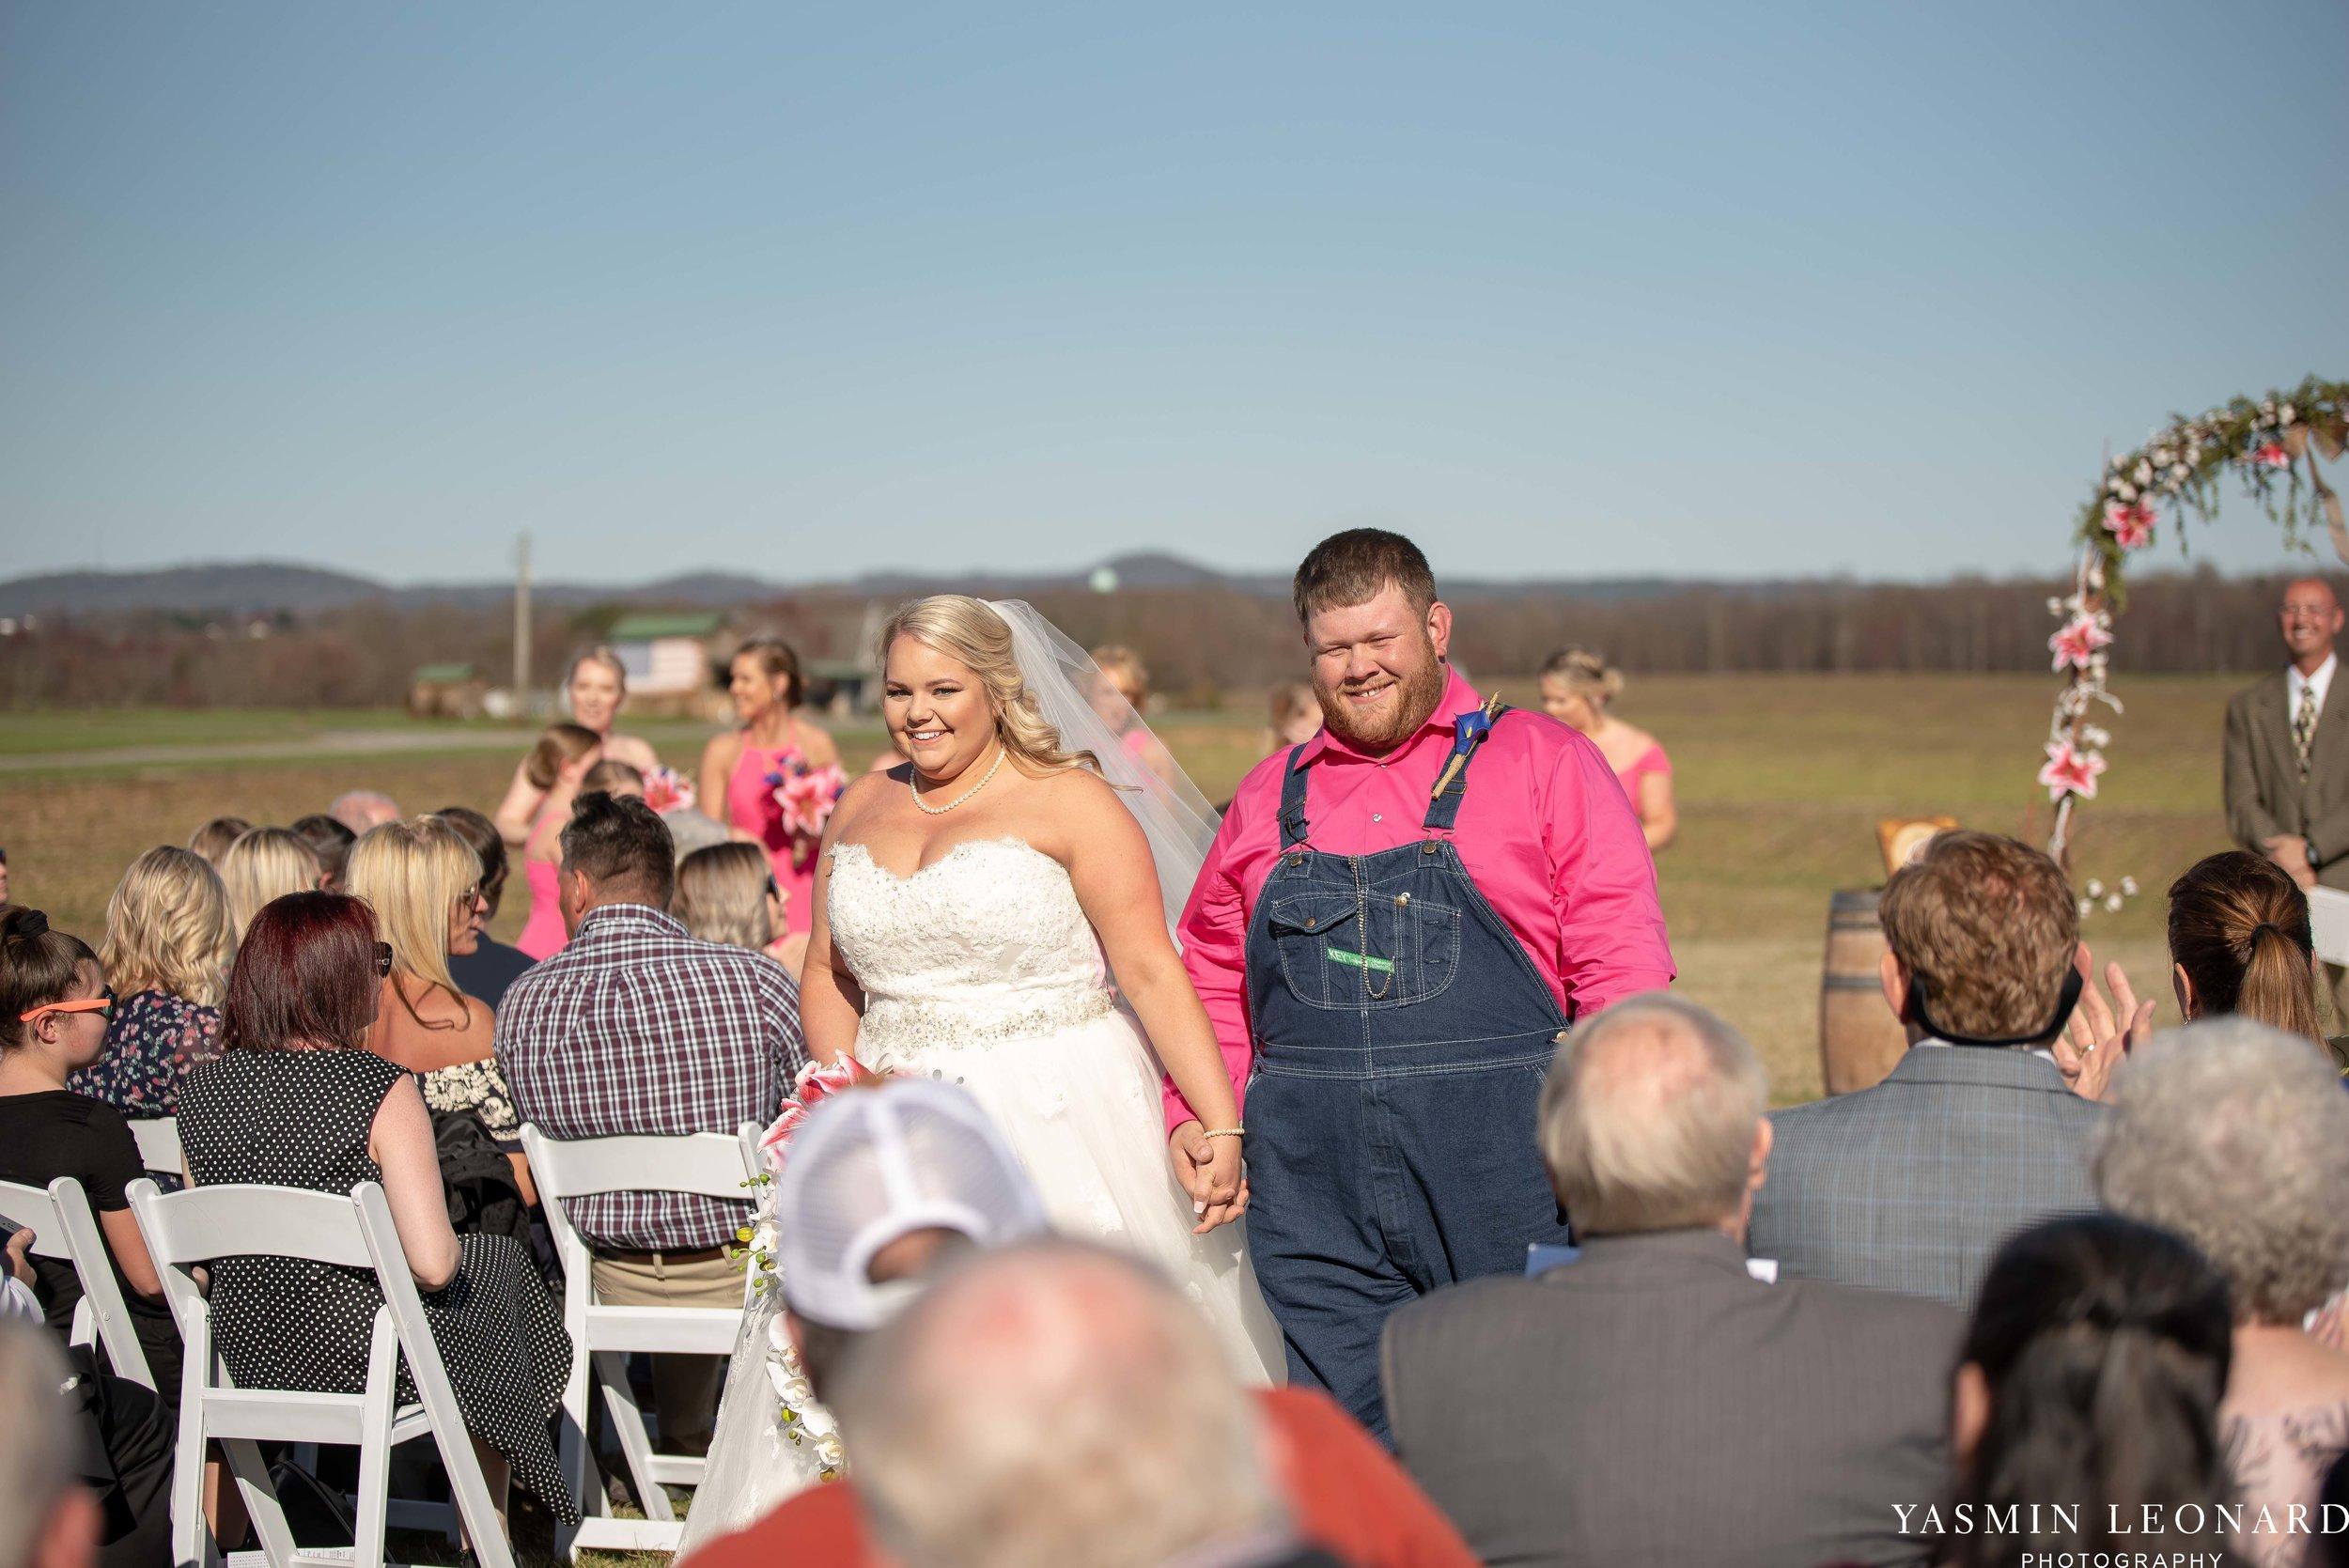 The Barn at Heritage Farm - Country Wedding - Pink and Blue Wedding - Barn Wedding - Outdoor Wedding - Cotton and Wheat Decor - Groom in Bibs - Pink Bridal Colors - Yasmin Leonard Photography-16.jpg